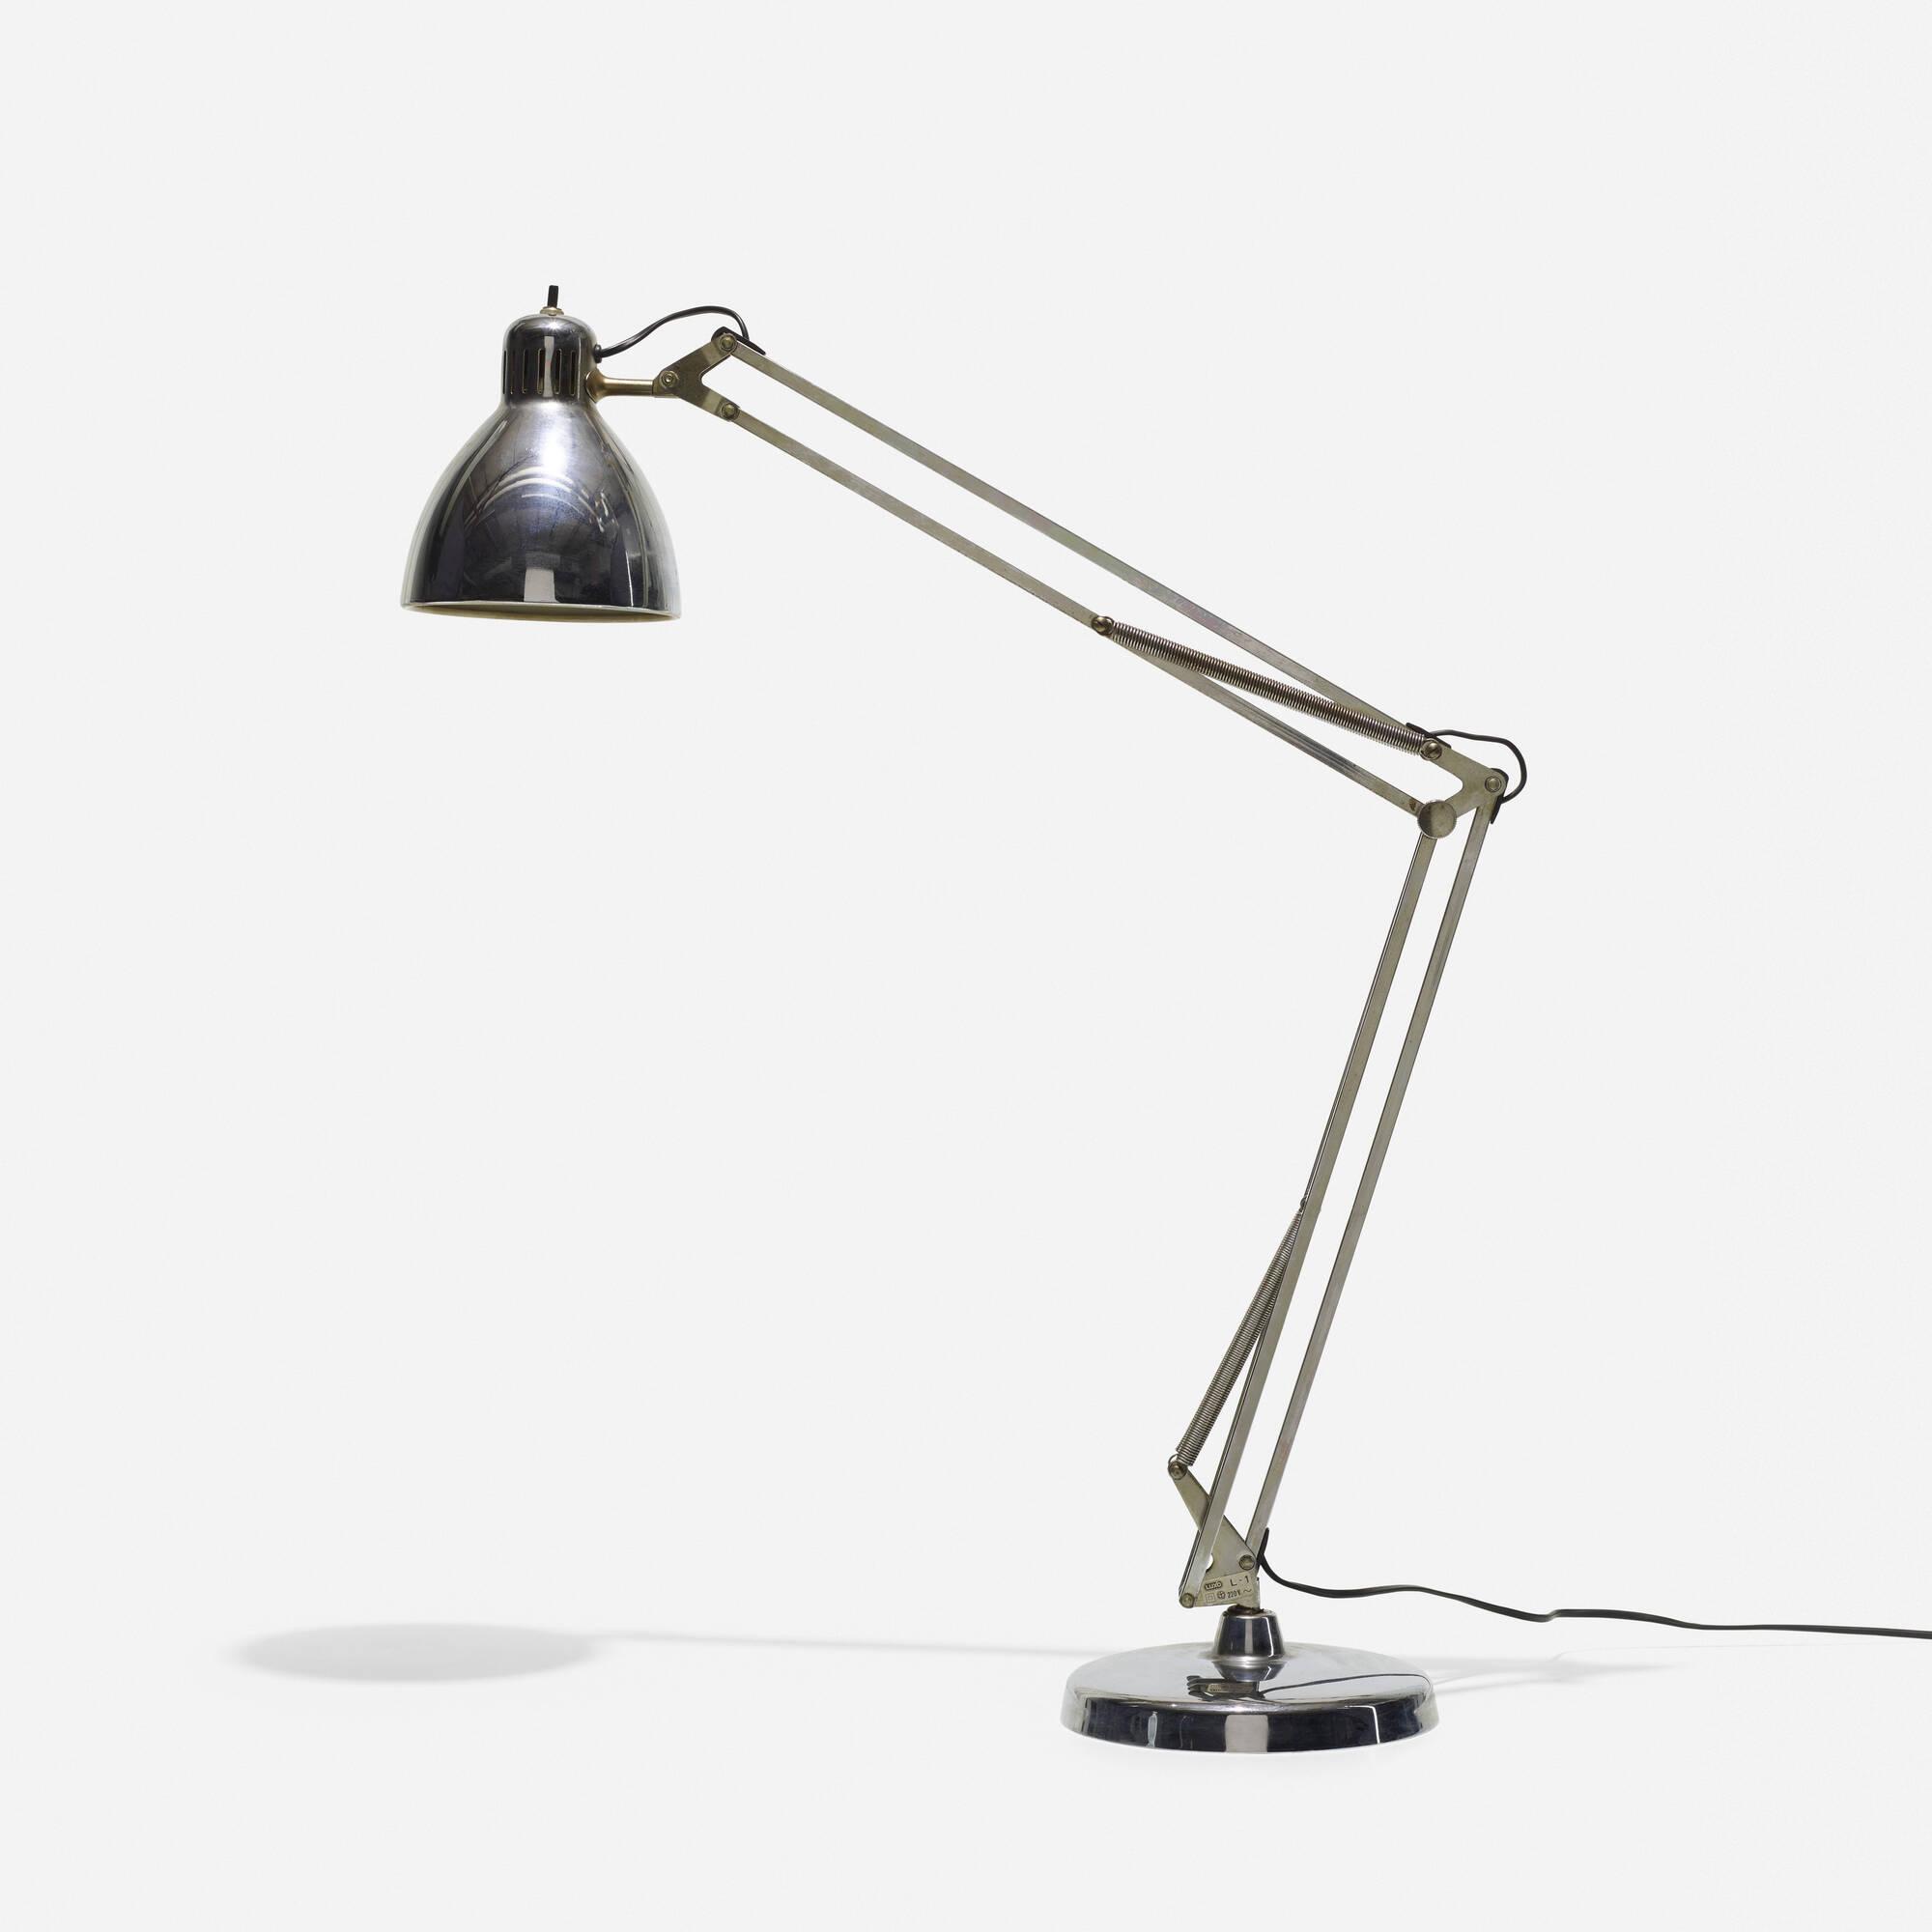 319: Jac Jacobsen / L-1 table lamp (1 of 1)